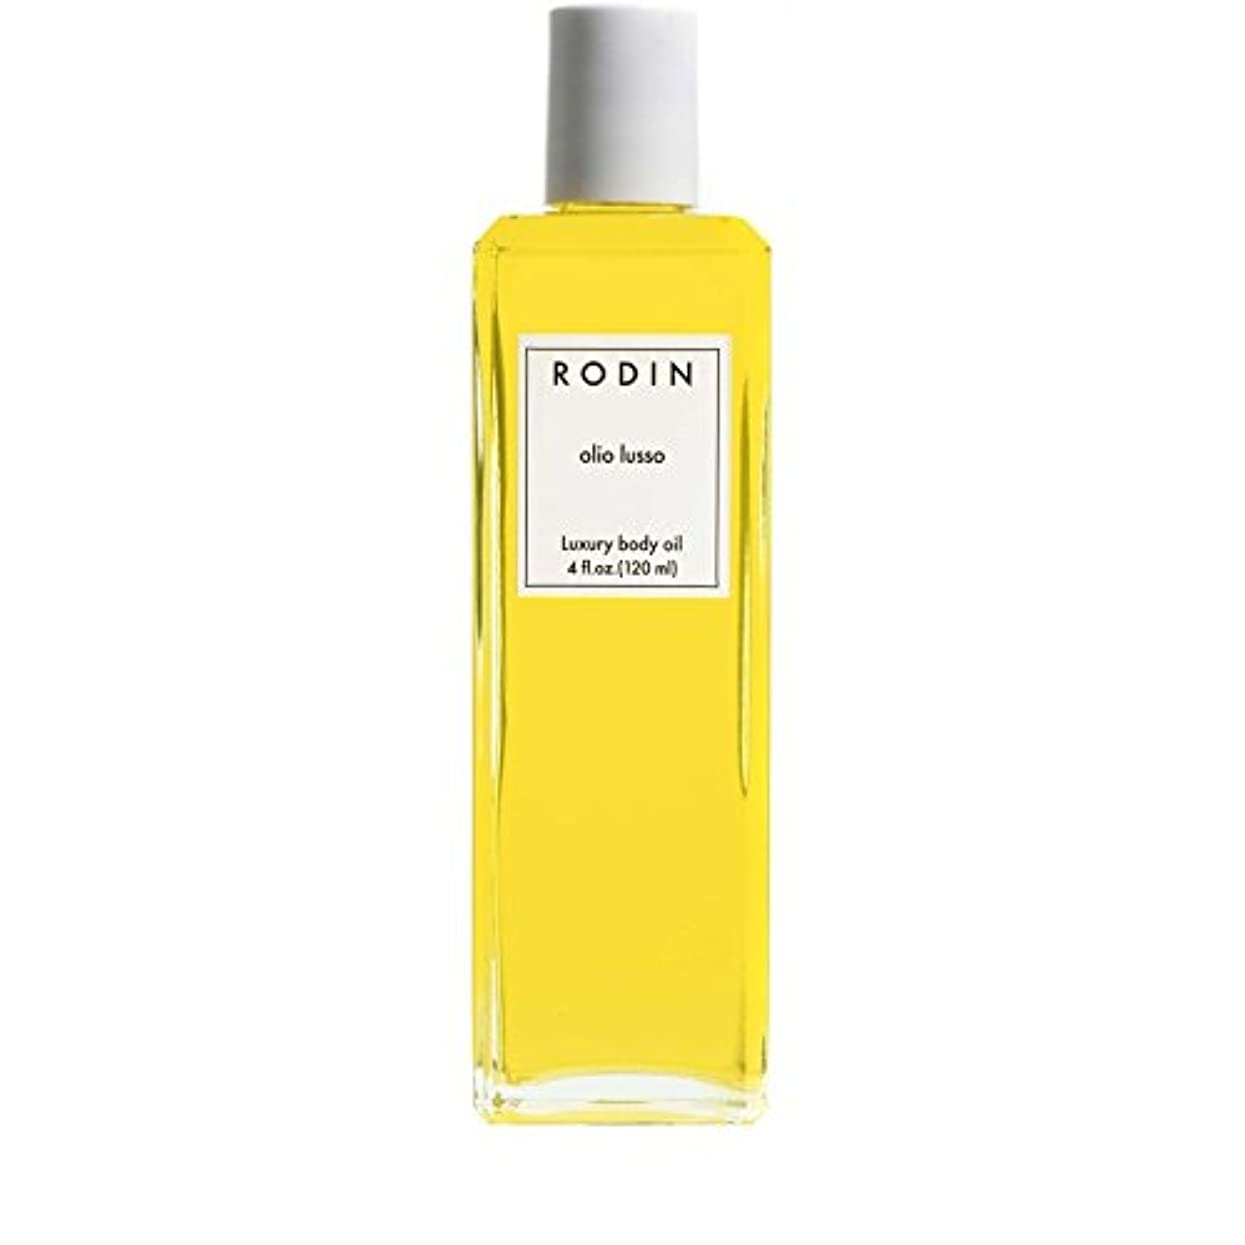 RODIN olio lusso Jasmine & Neroli Luxury Body Oil 120ml - ロダンルッソジャスミン&ネロリ贅沢なボディオイル120ミリリットル [並行輸入品]